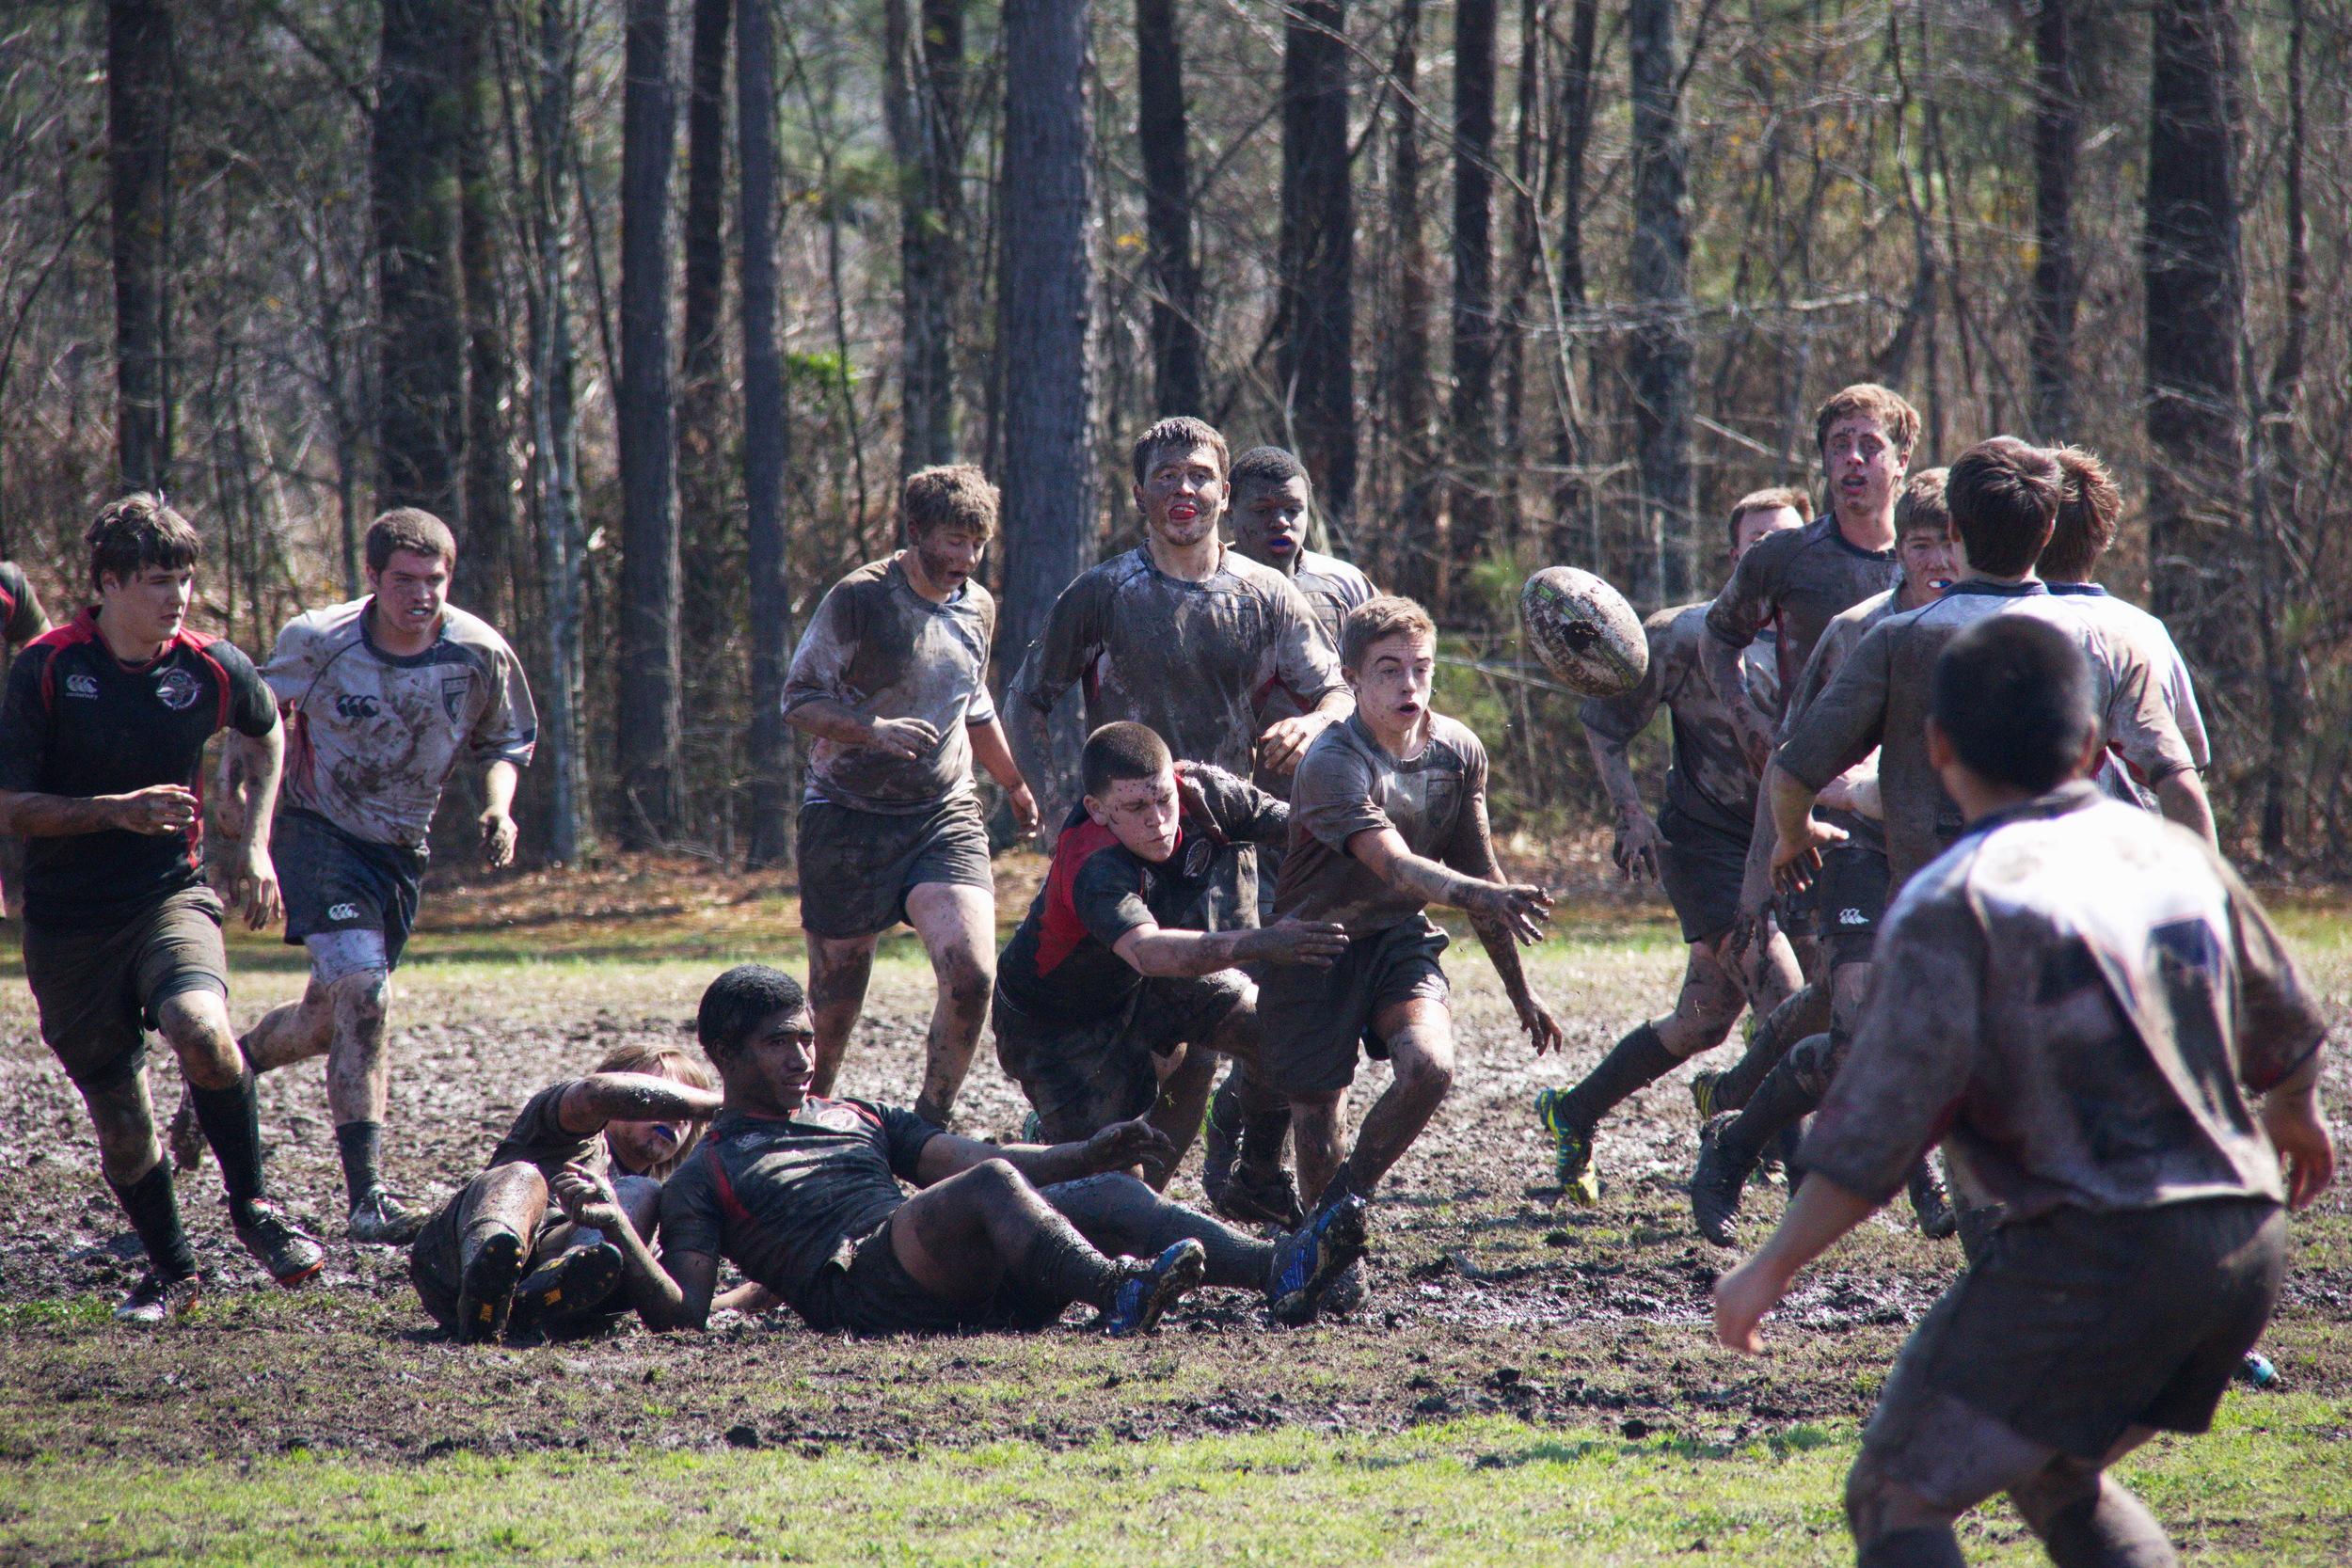 The Arkansas Mud Bowl